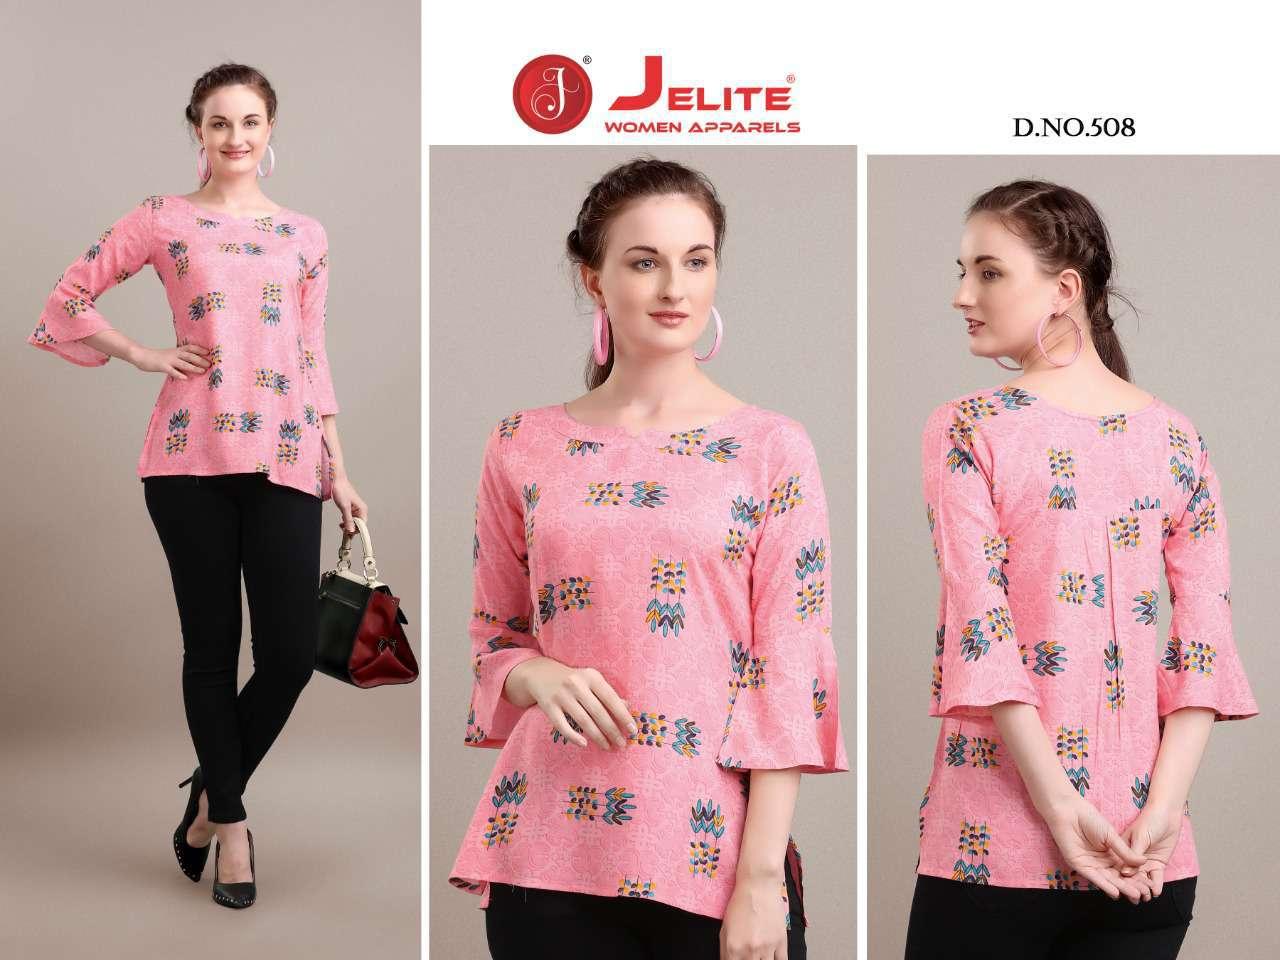 Jelite Camellia Tops Wholesale Catalog 8 Pcs 9 - Jelite Camellia Tops Wholesale Catalog 8 Pcs